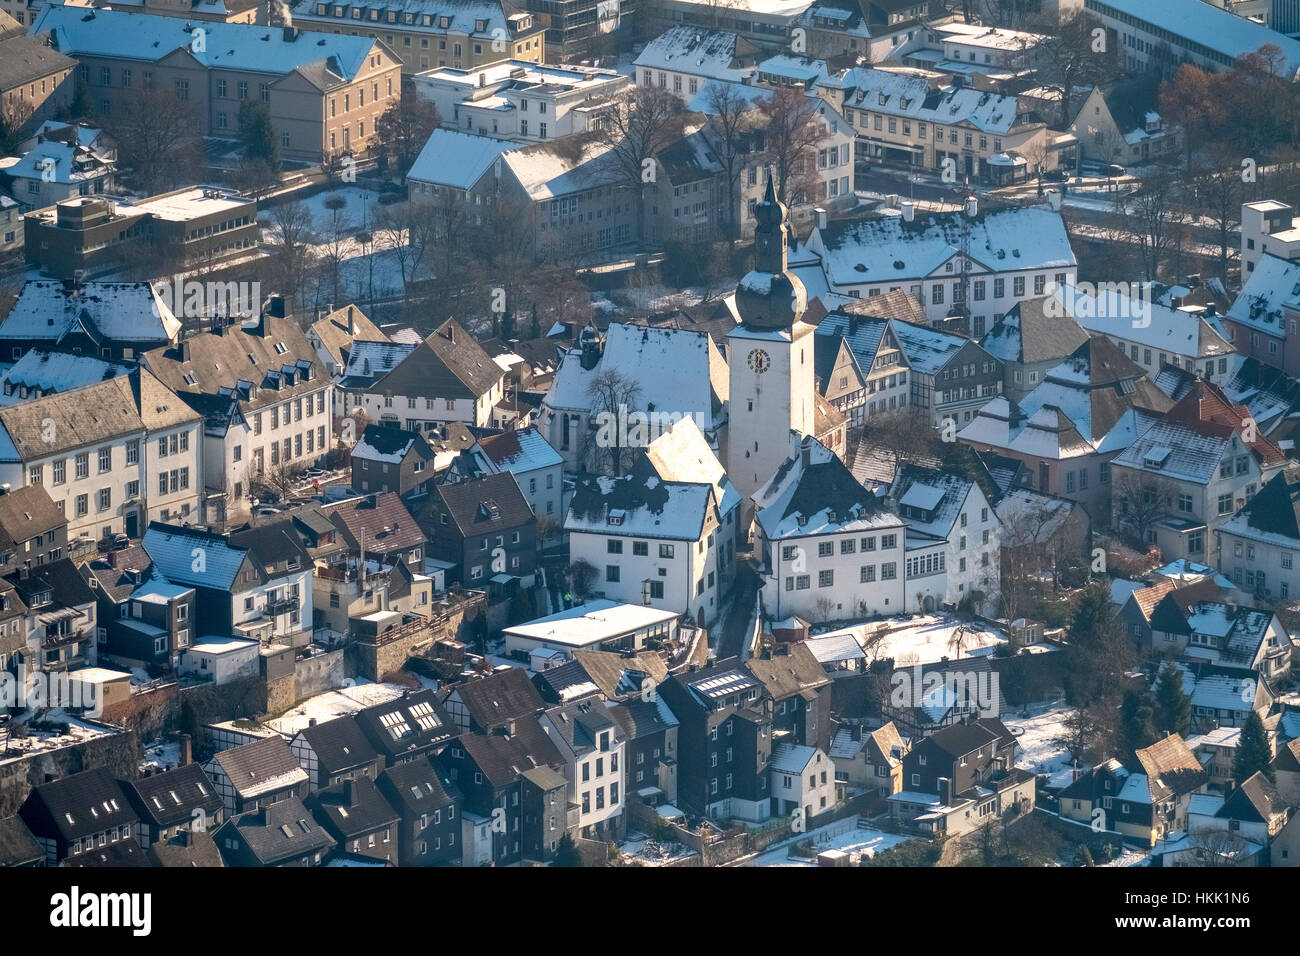 Wintery old town of Arnsberg, bell tower, snow, winter, Arnsberg, Sauerland, North Rhine-Westphalia, Germany - Stock Image